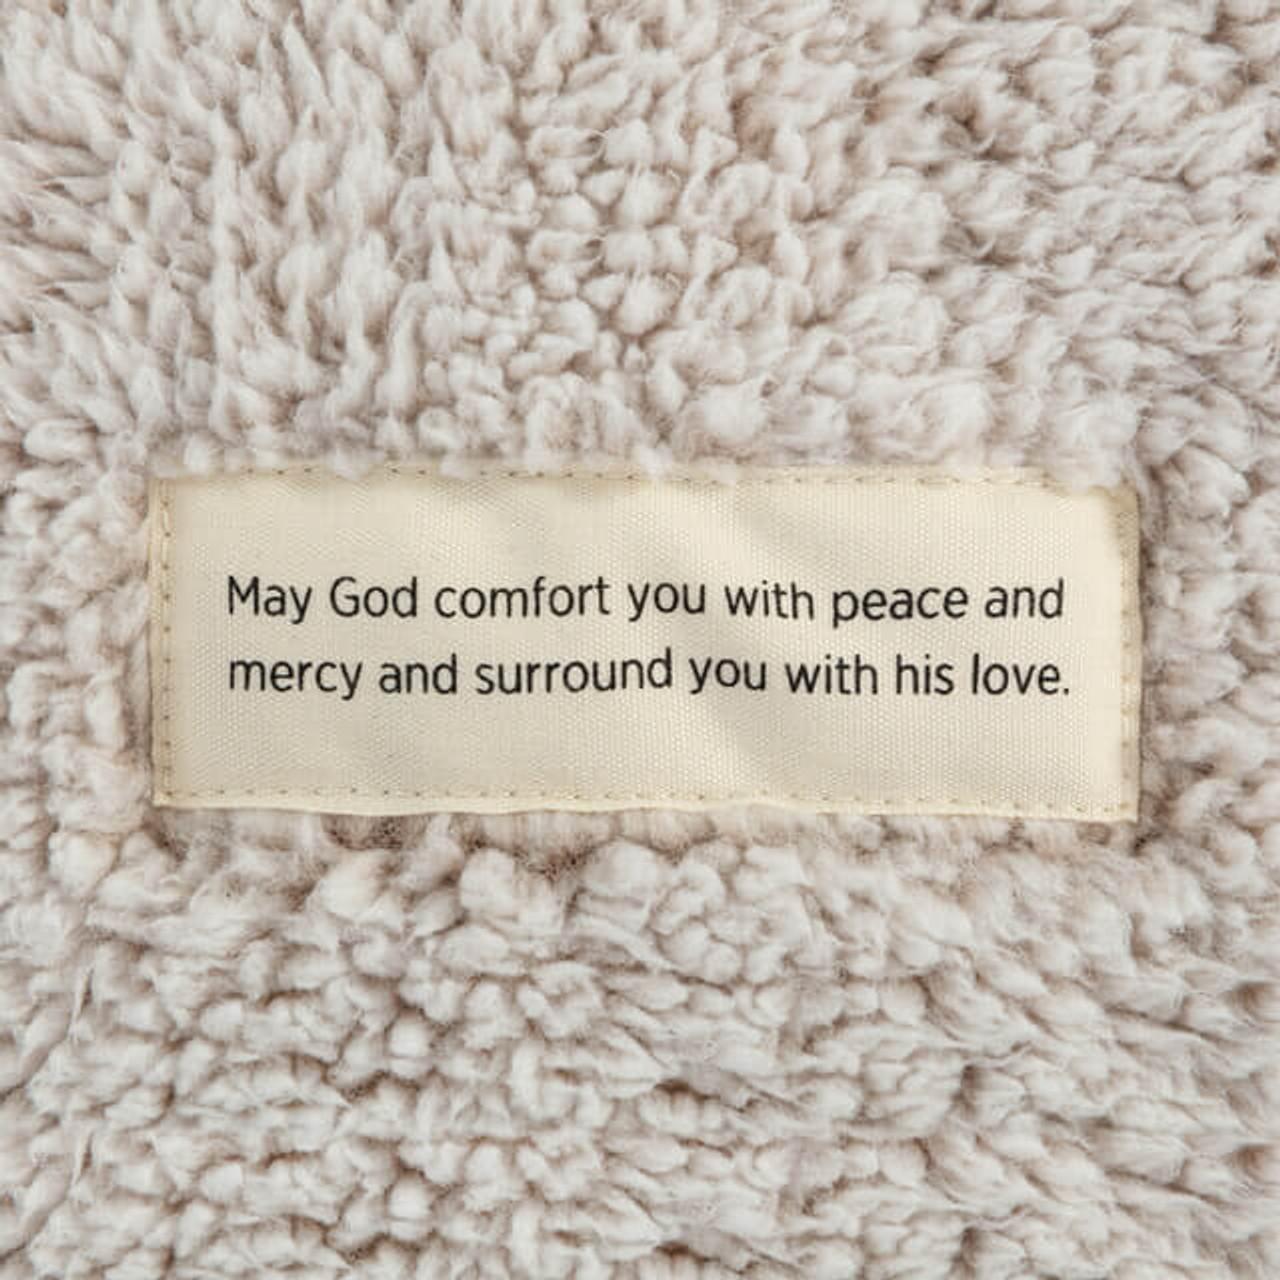 Demdaco remembrance comfort peace plush prayer blanket